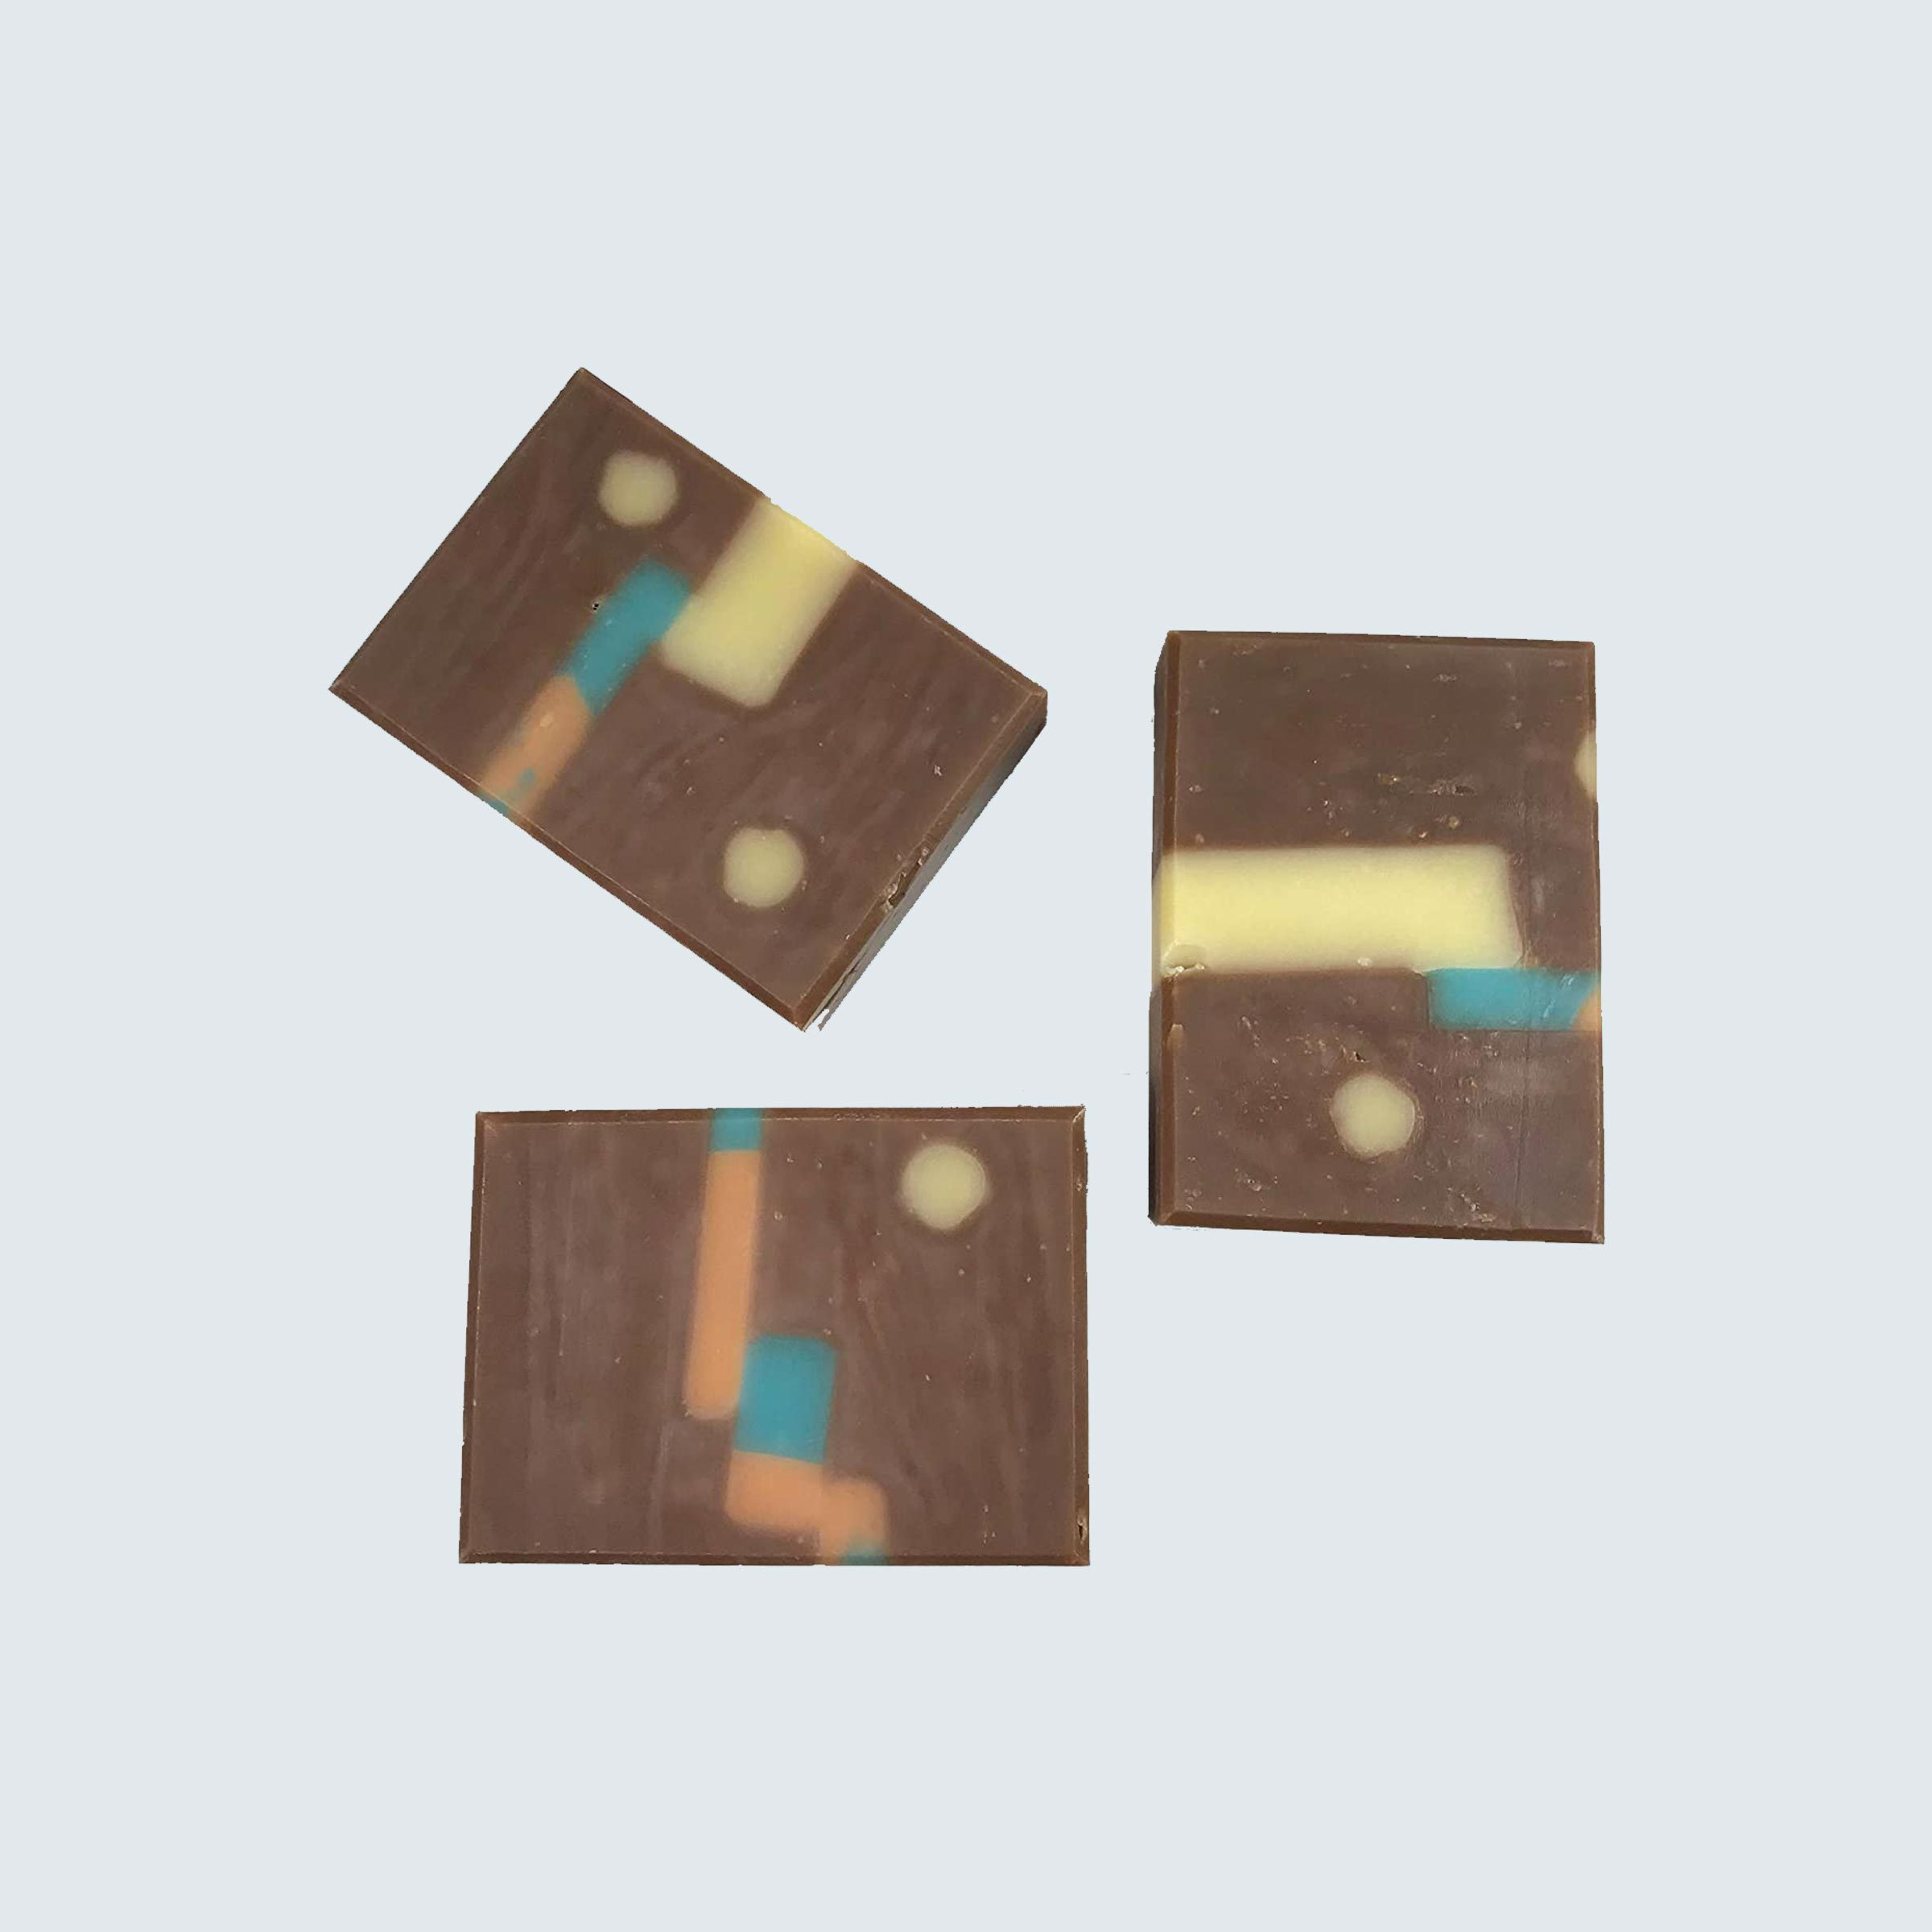 The Corner Handmade soaps